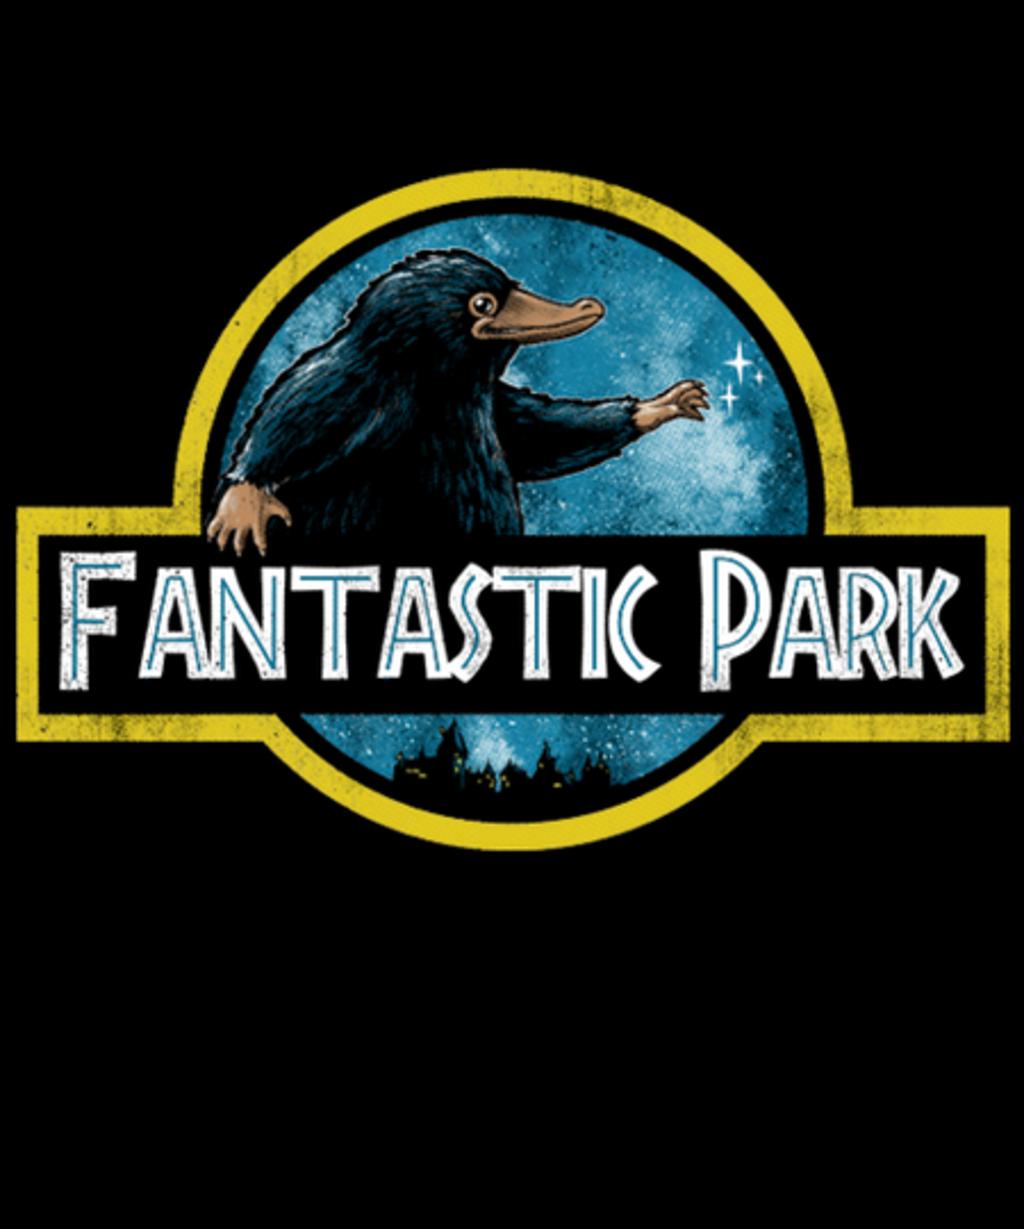 Qwertee: FANTASTIC PARK